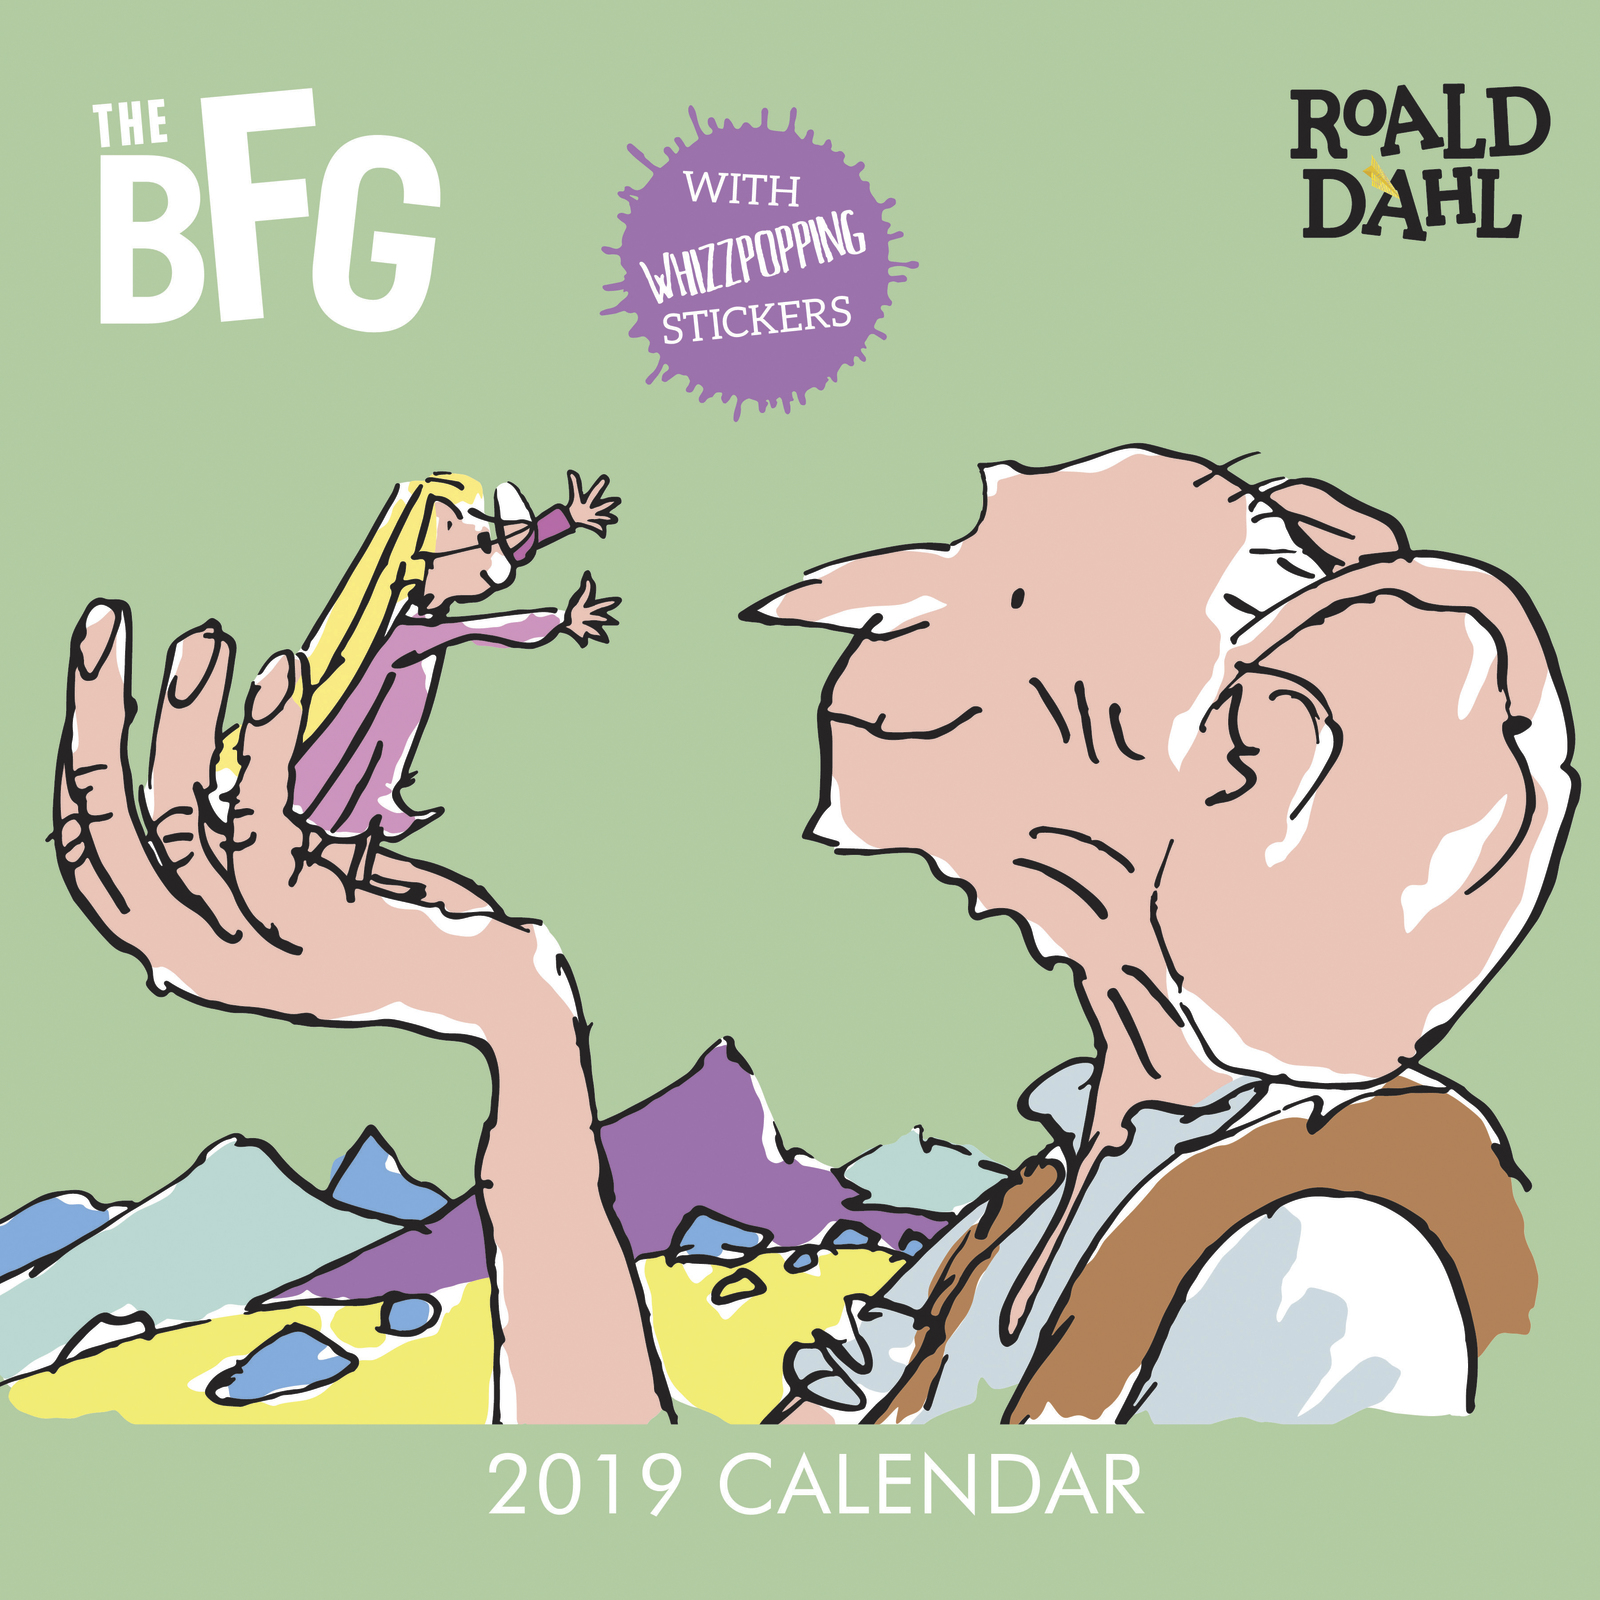 Roald Dahl: The BFG 2019 Wall Calendar image